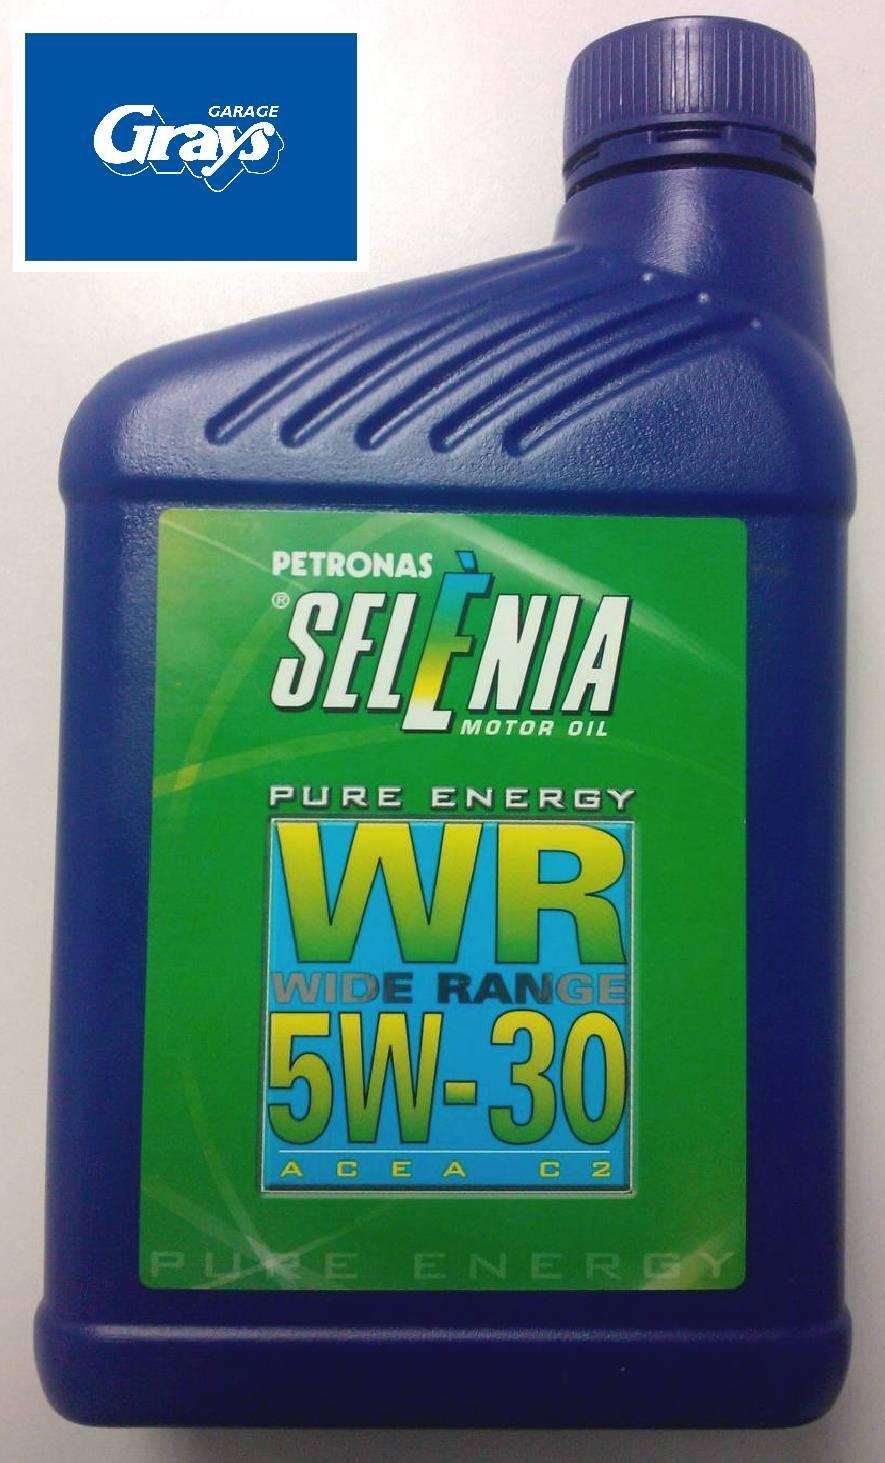 Selenia Wr 5w 30 Engine Oil Petronas Selenia Wr 5w 30